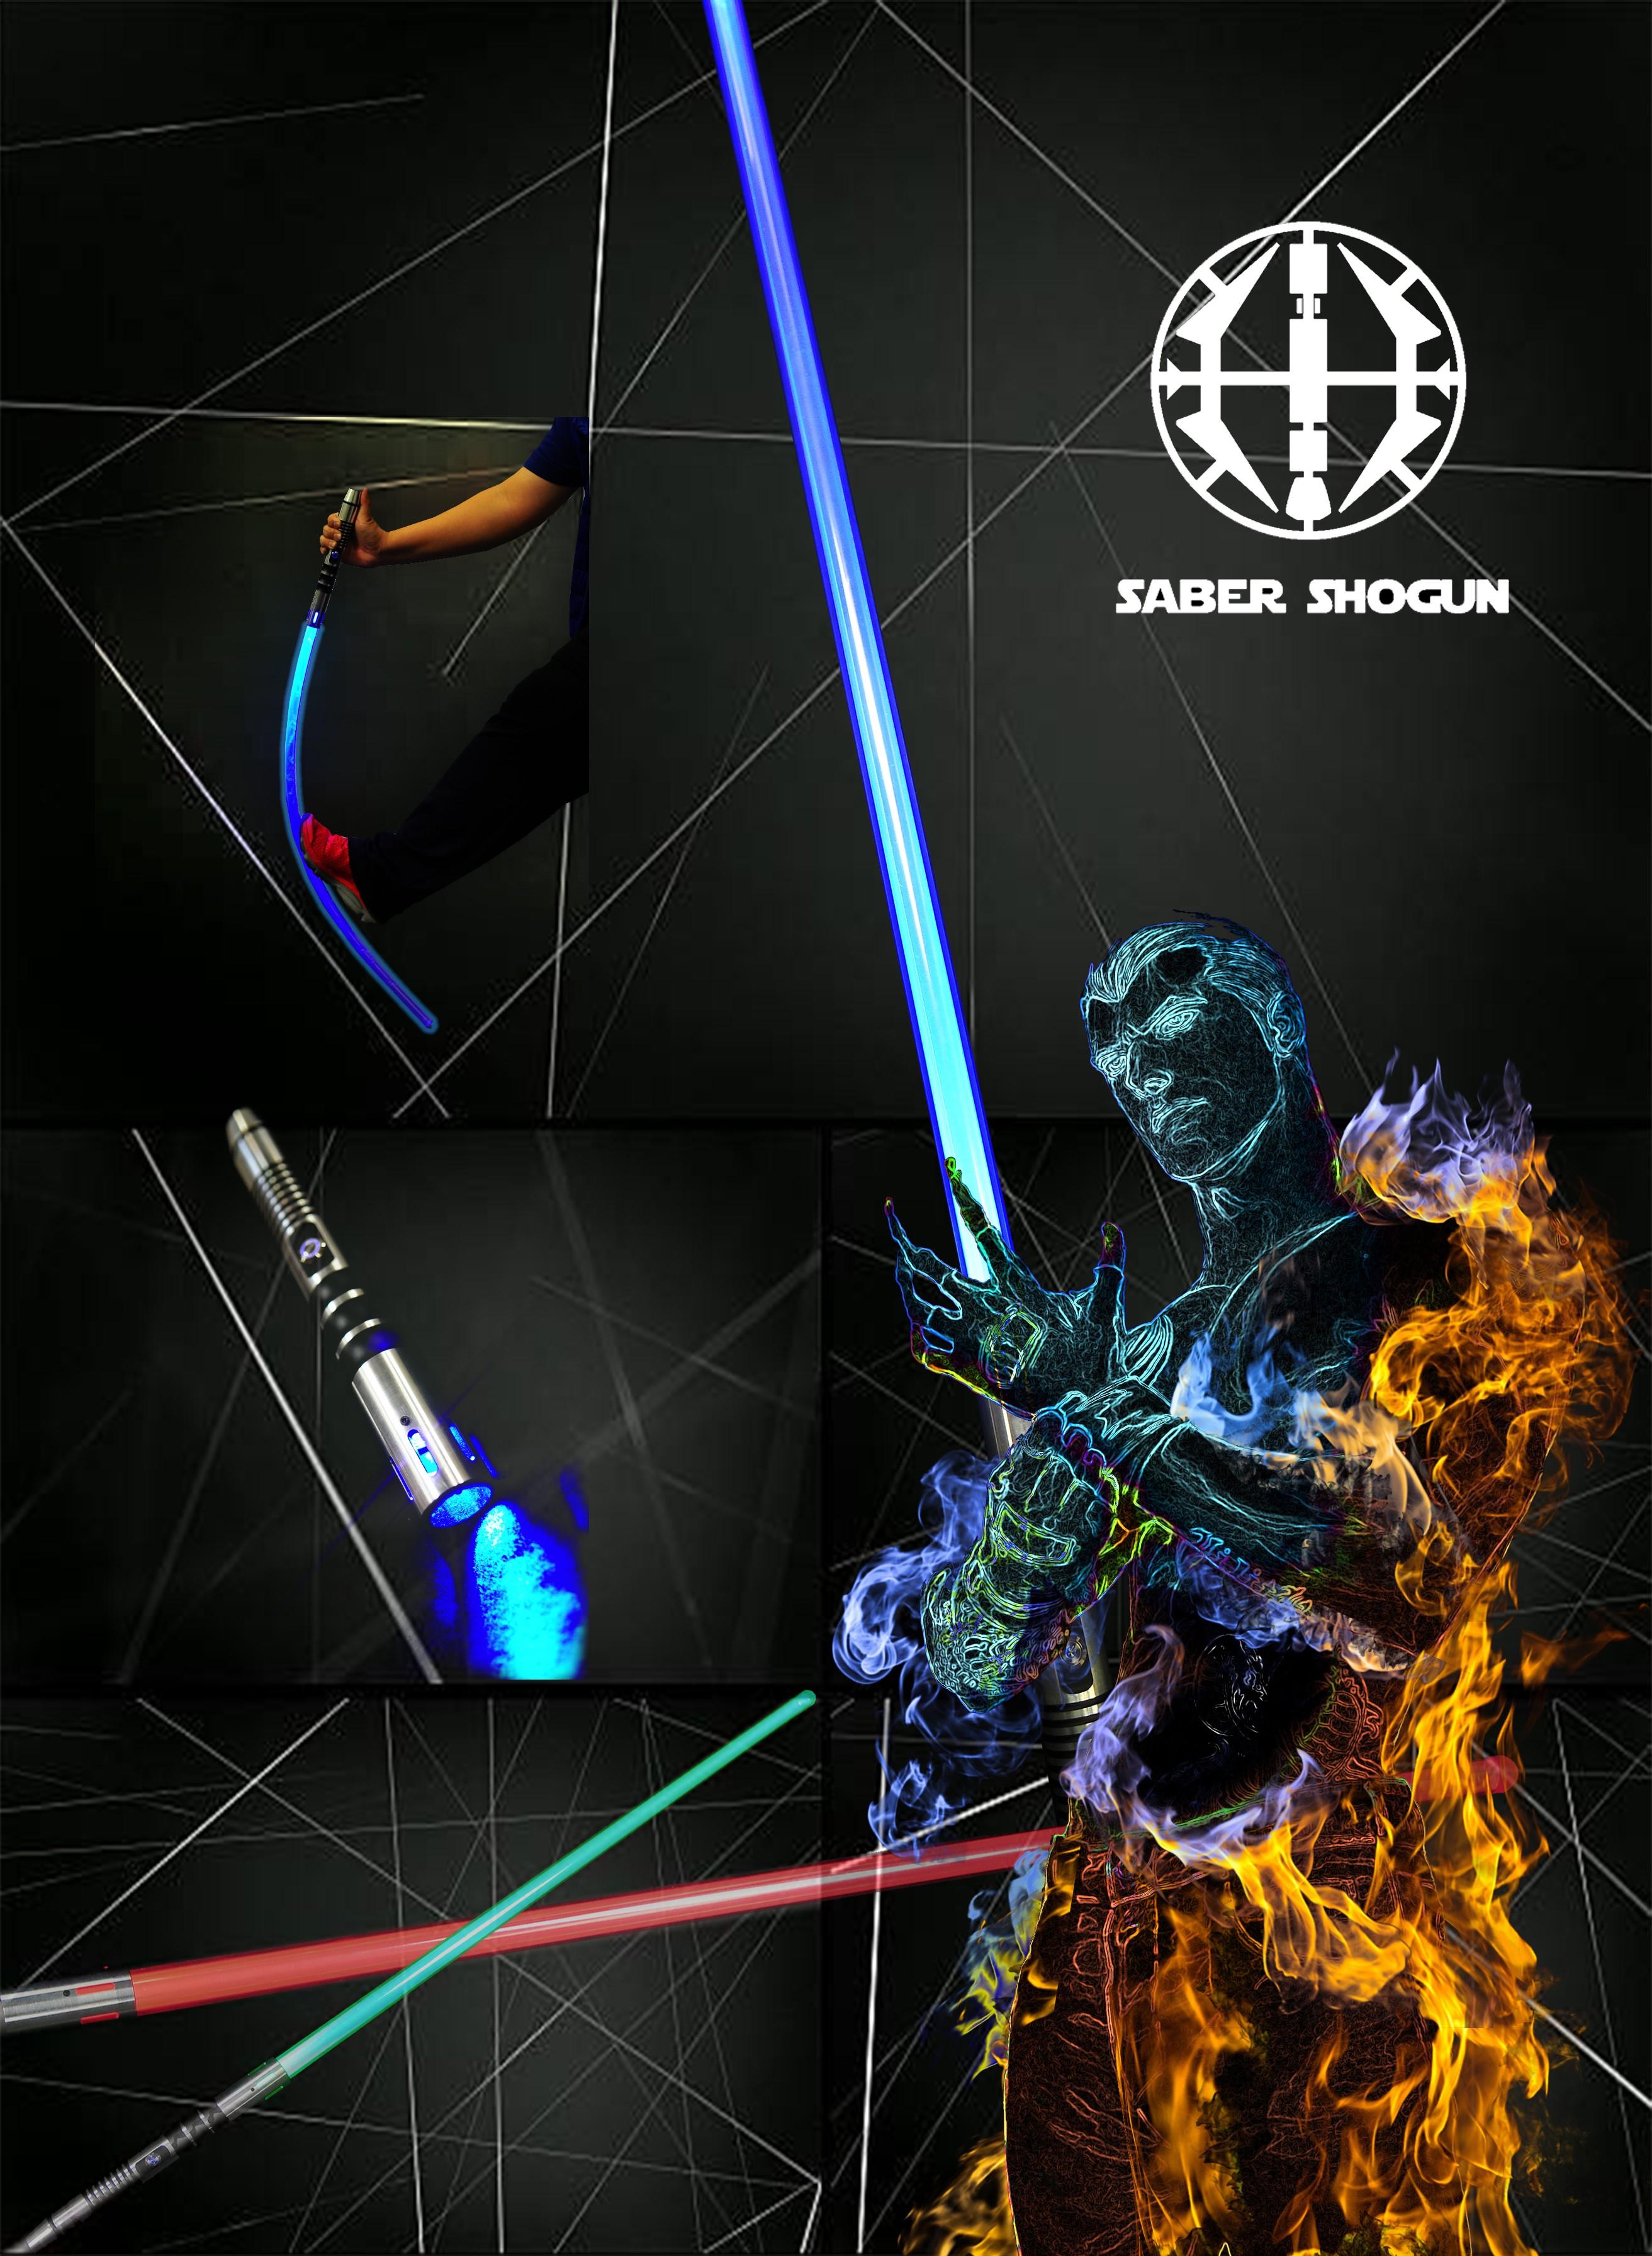 Saber Shogun Poster 1